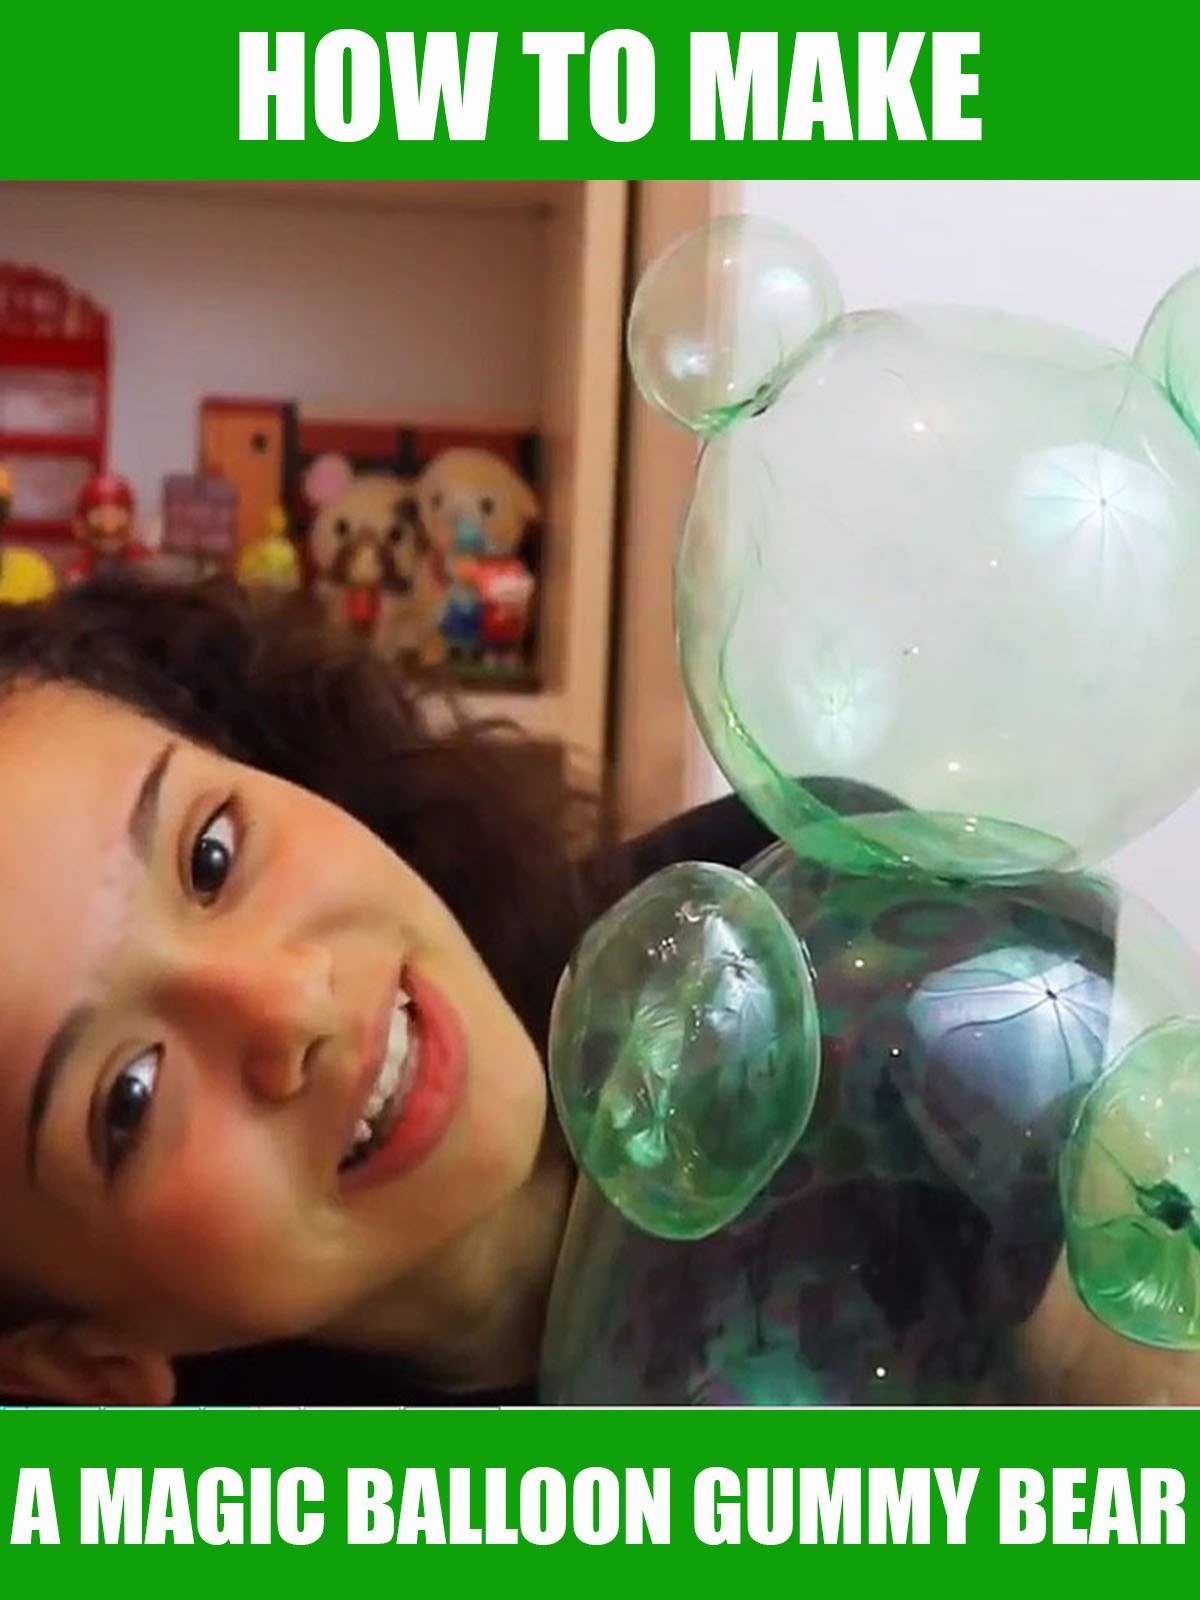 How to Make a Magic Balloon Gummy Bear